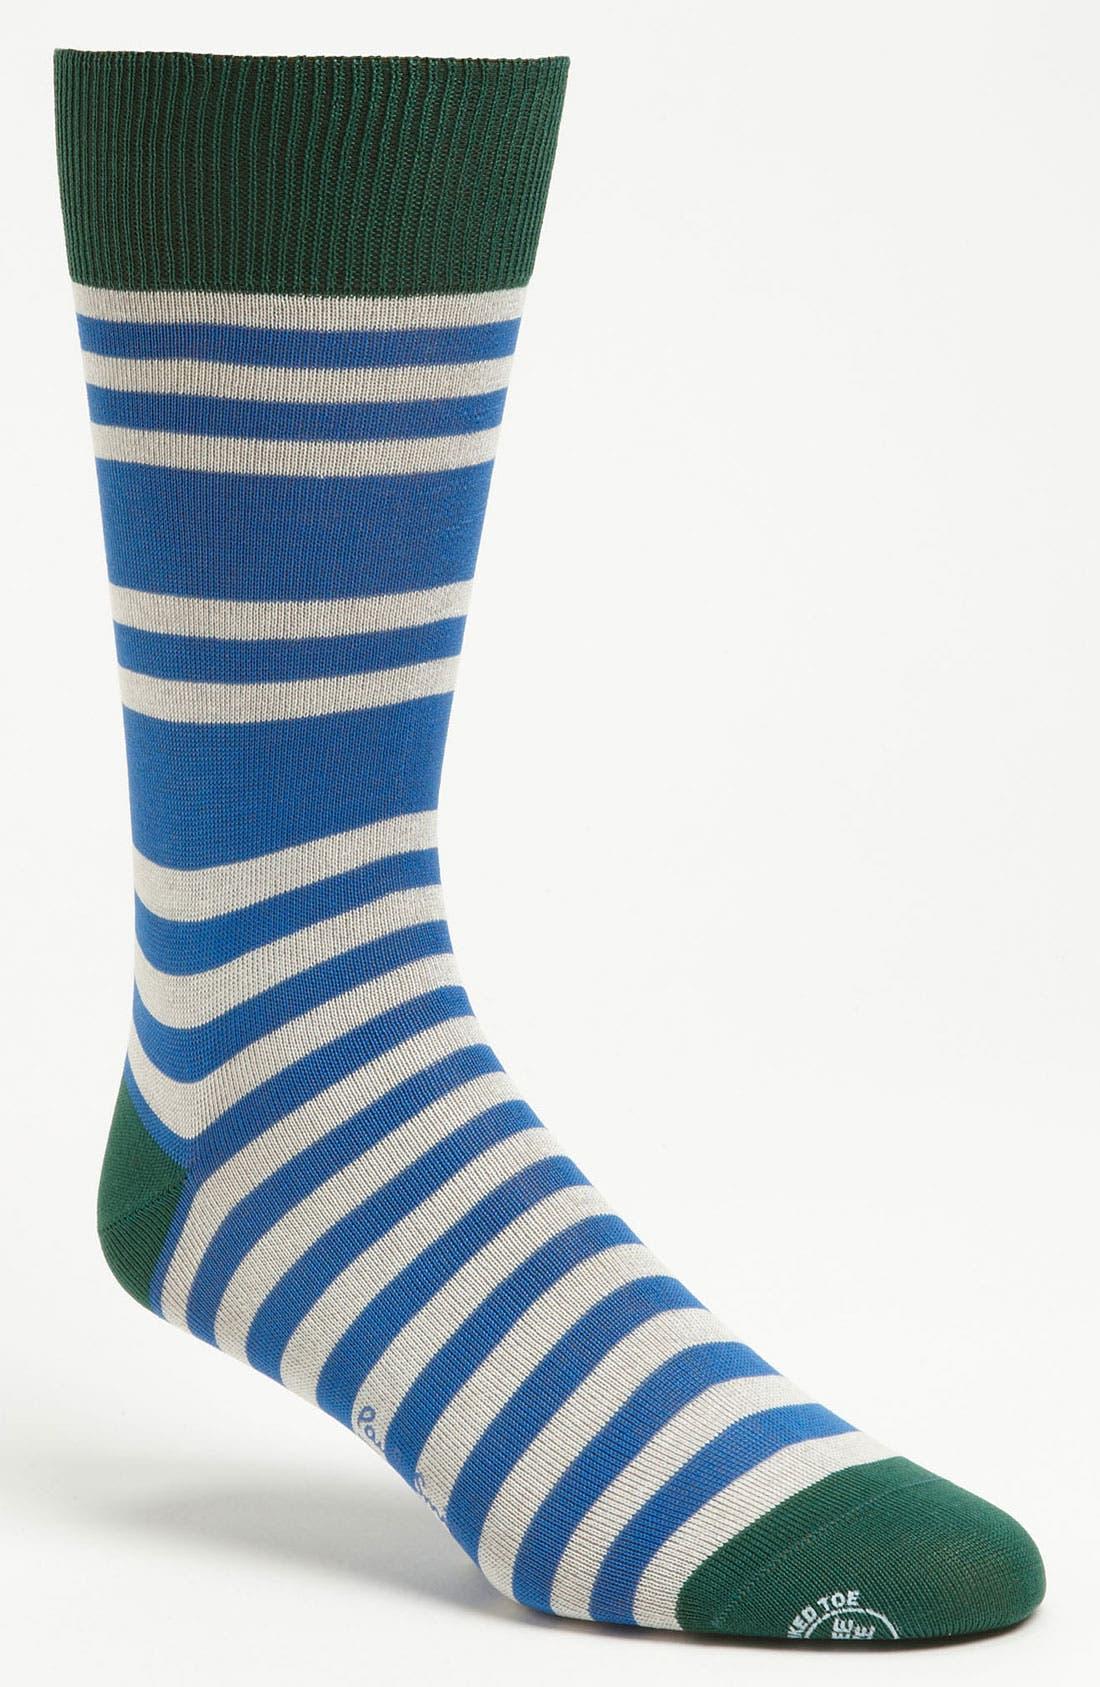 Alternate Image 1 Selected - Paul Smith Accessories 'Odd Bizmark' Socks